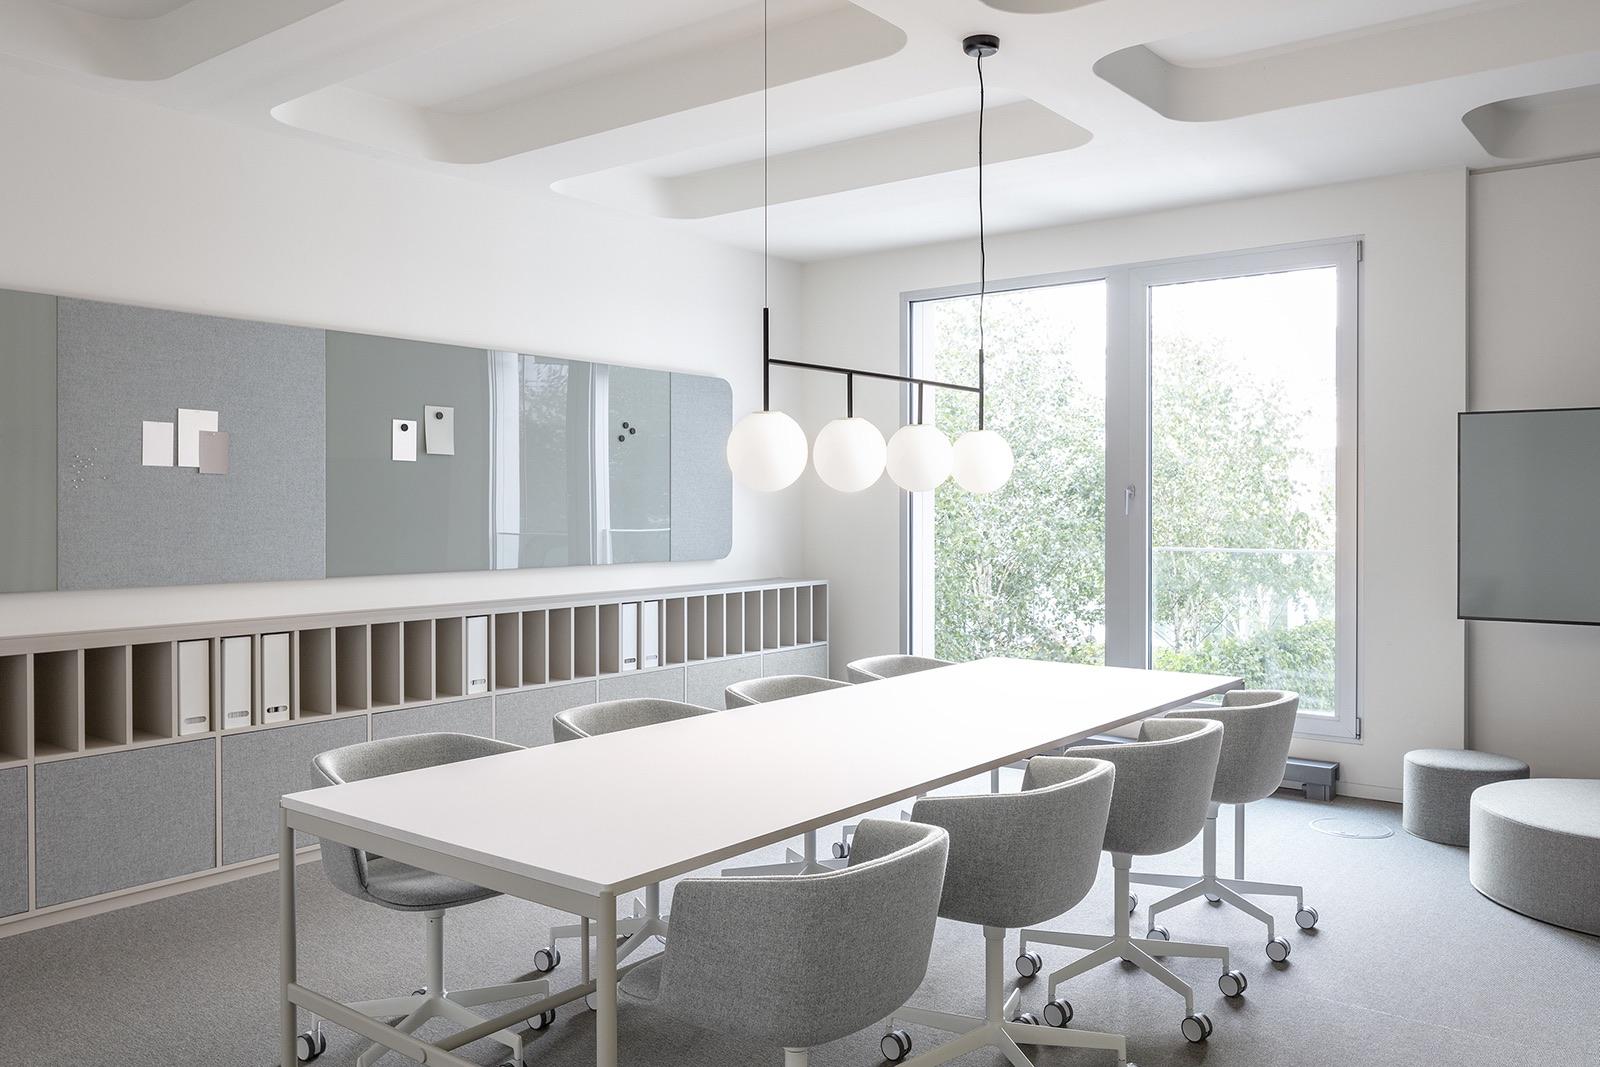 knskb-hamburg-office-13